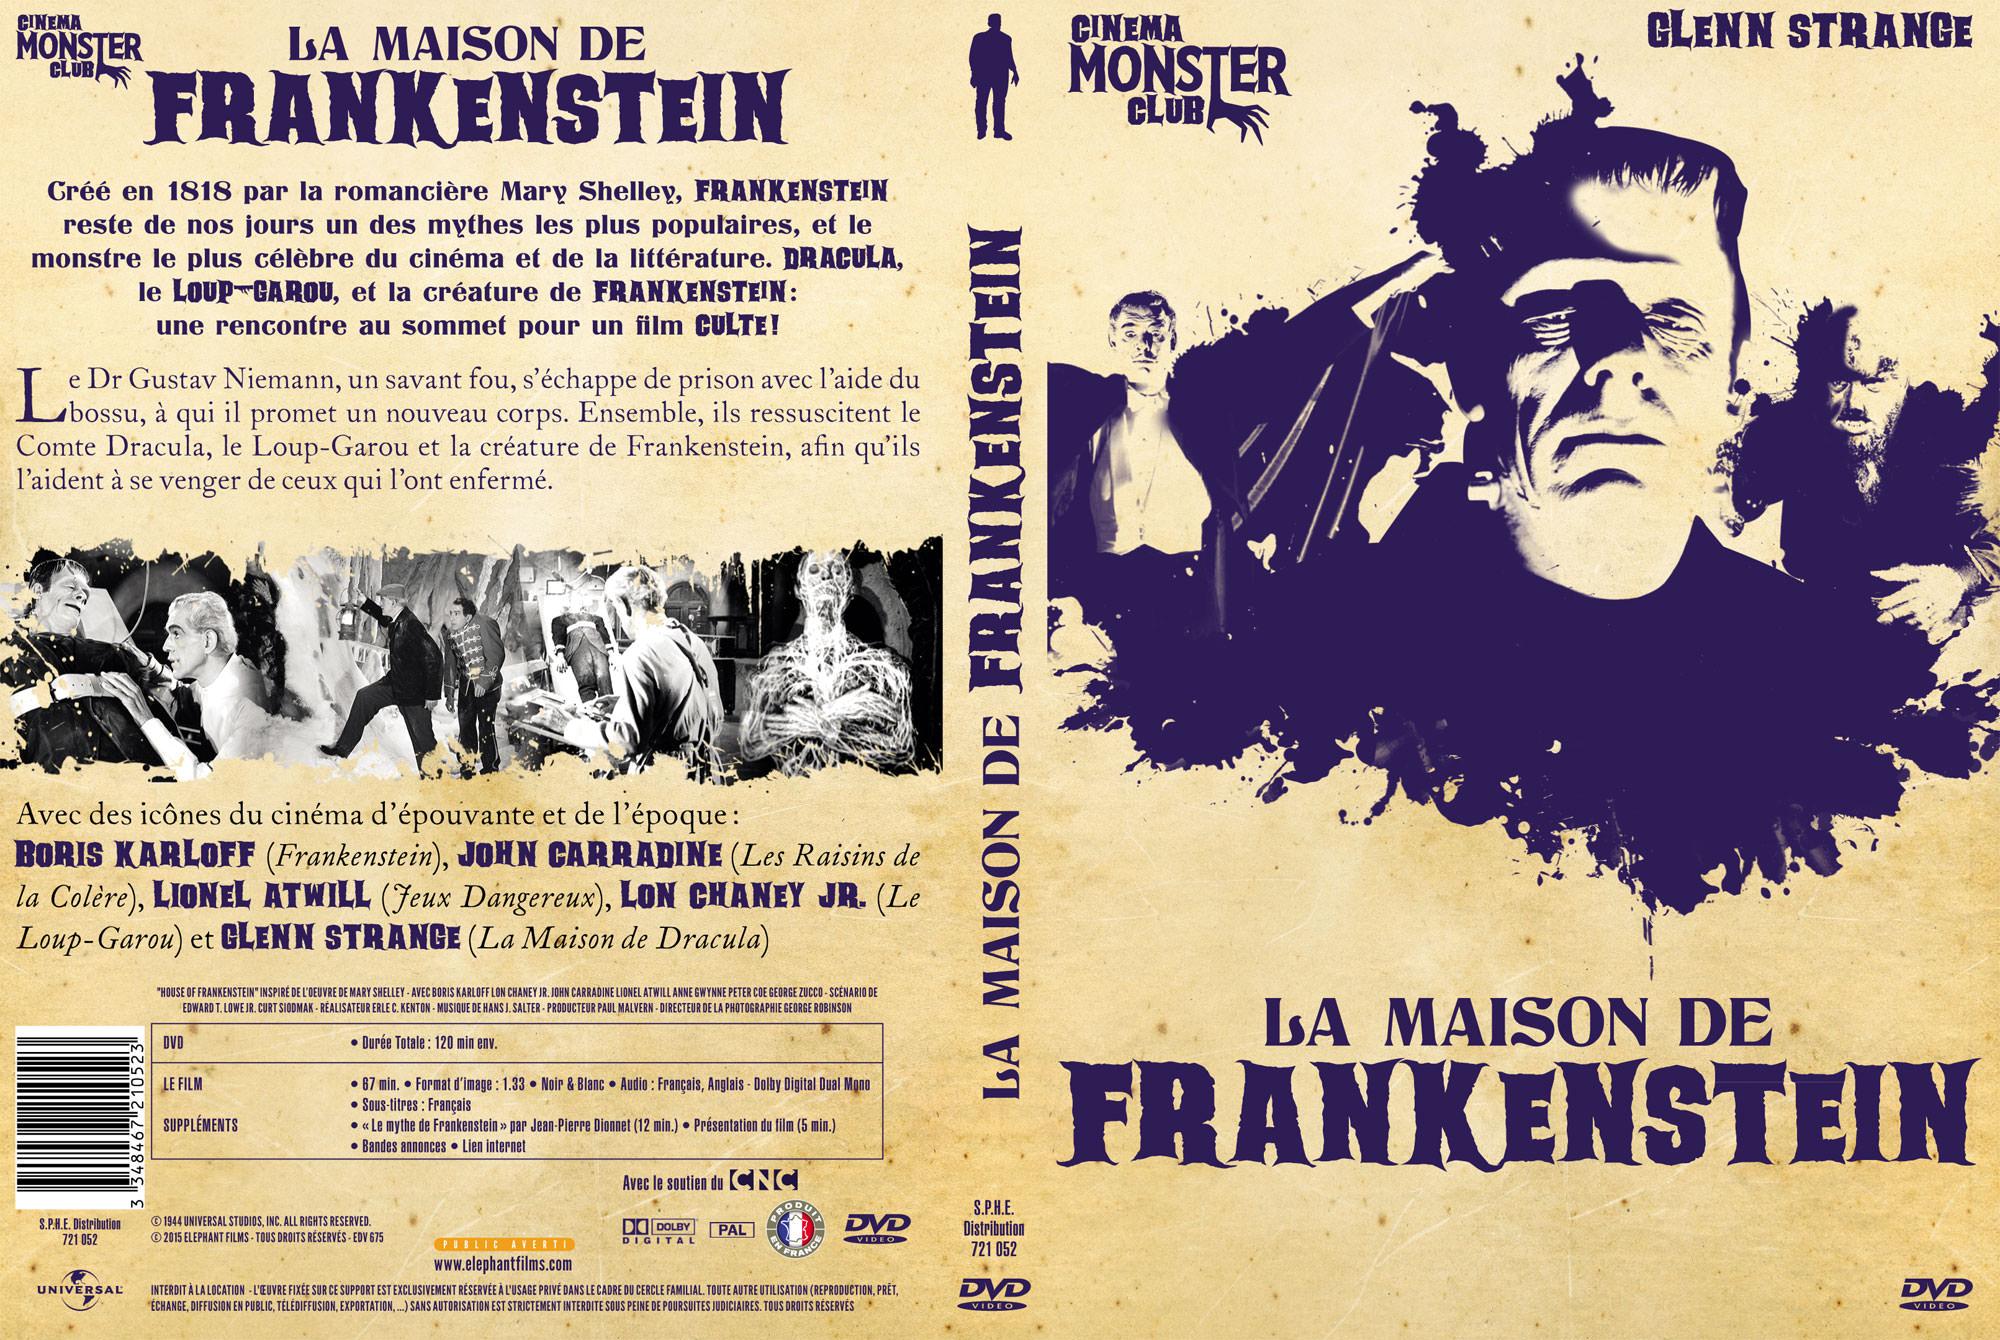 La Maison de Frankenstein - Jaquette DVD recto verso